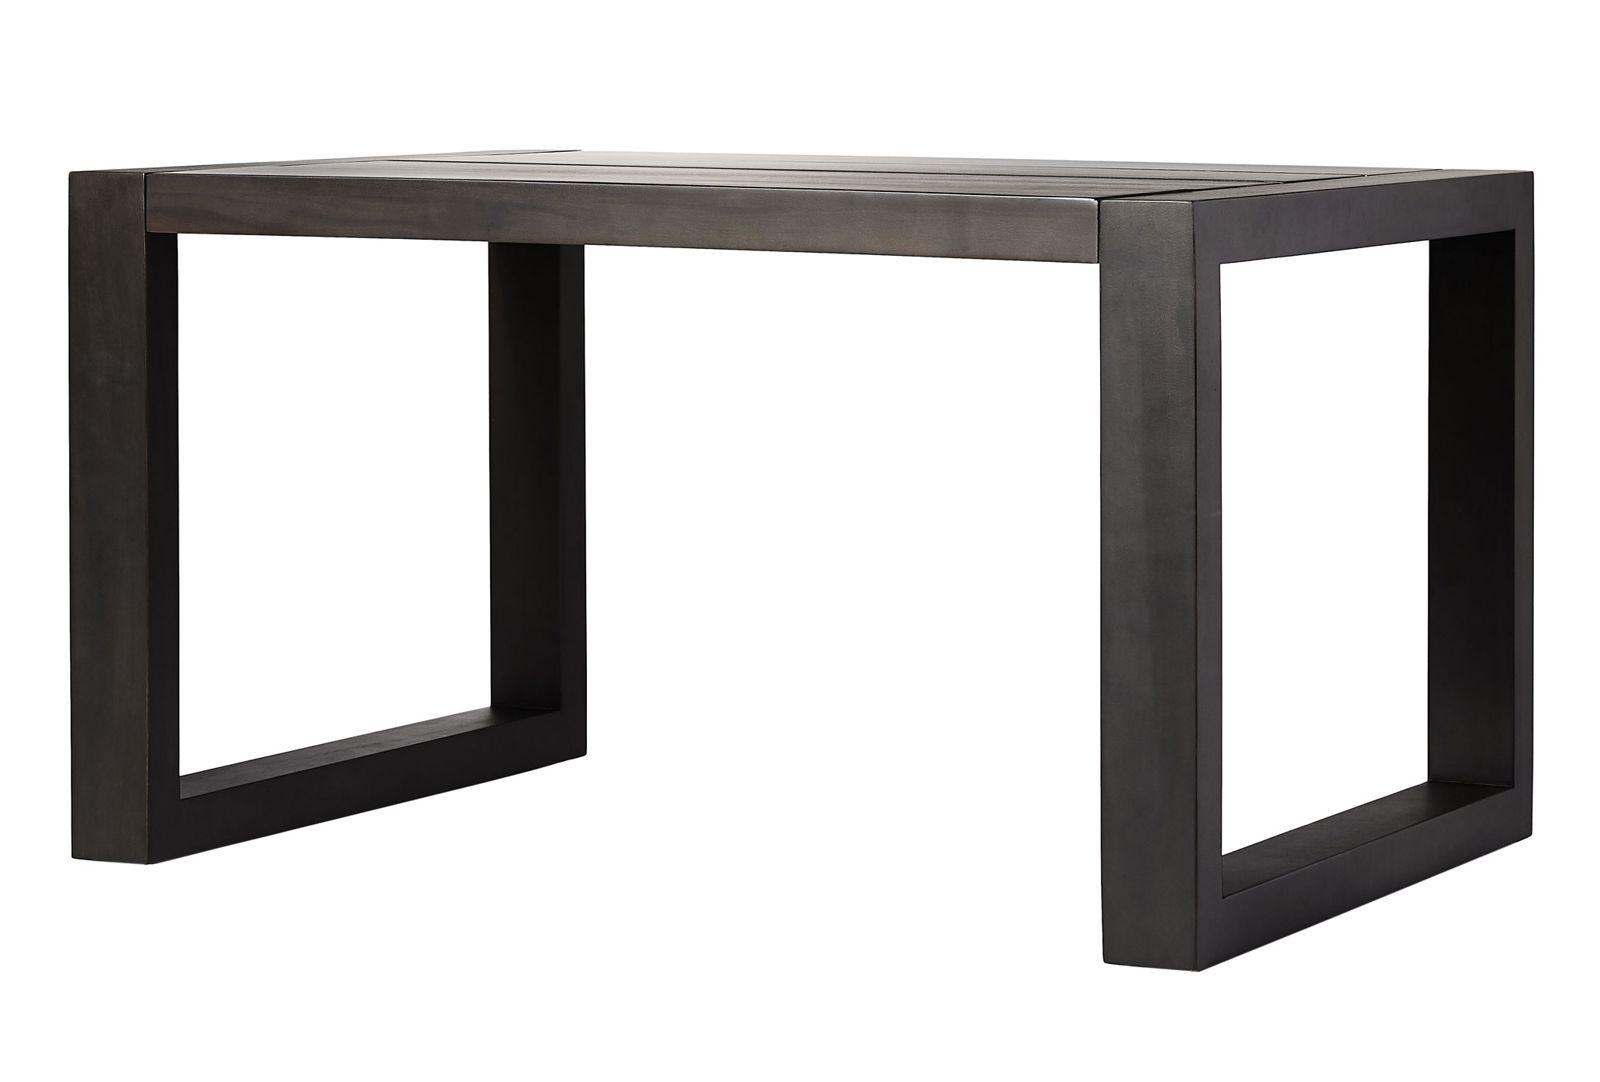 parson accent outdoor table modloft modern tables cressina dark eucalyptus furniture decorative cabinets for living room quatrefoil decor square thanksgiving tablecloth bedroom